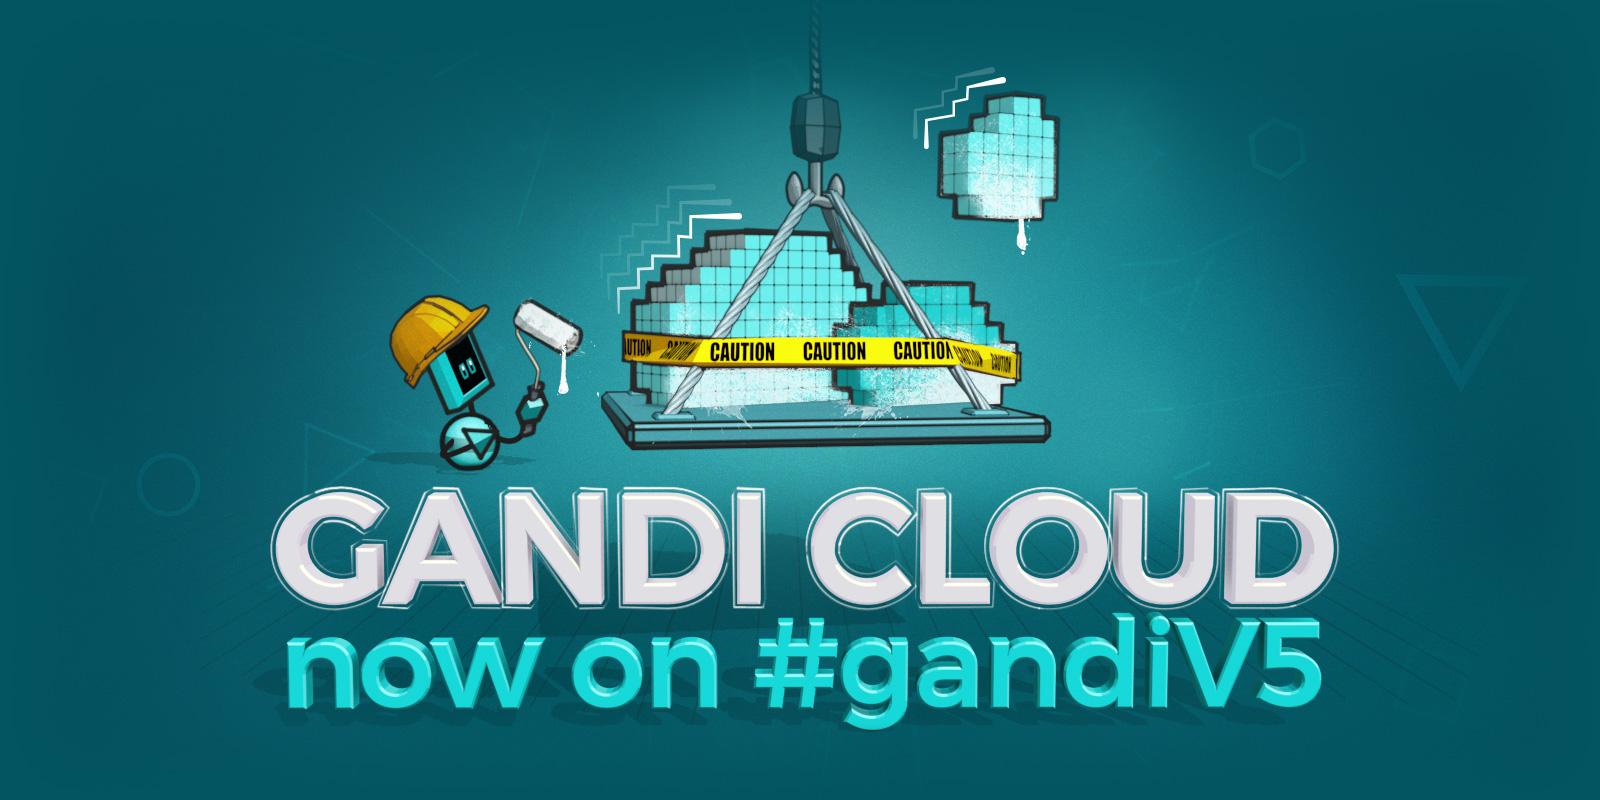 Gandi Cloud disponible sur #gandiV5